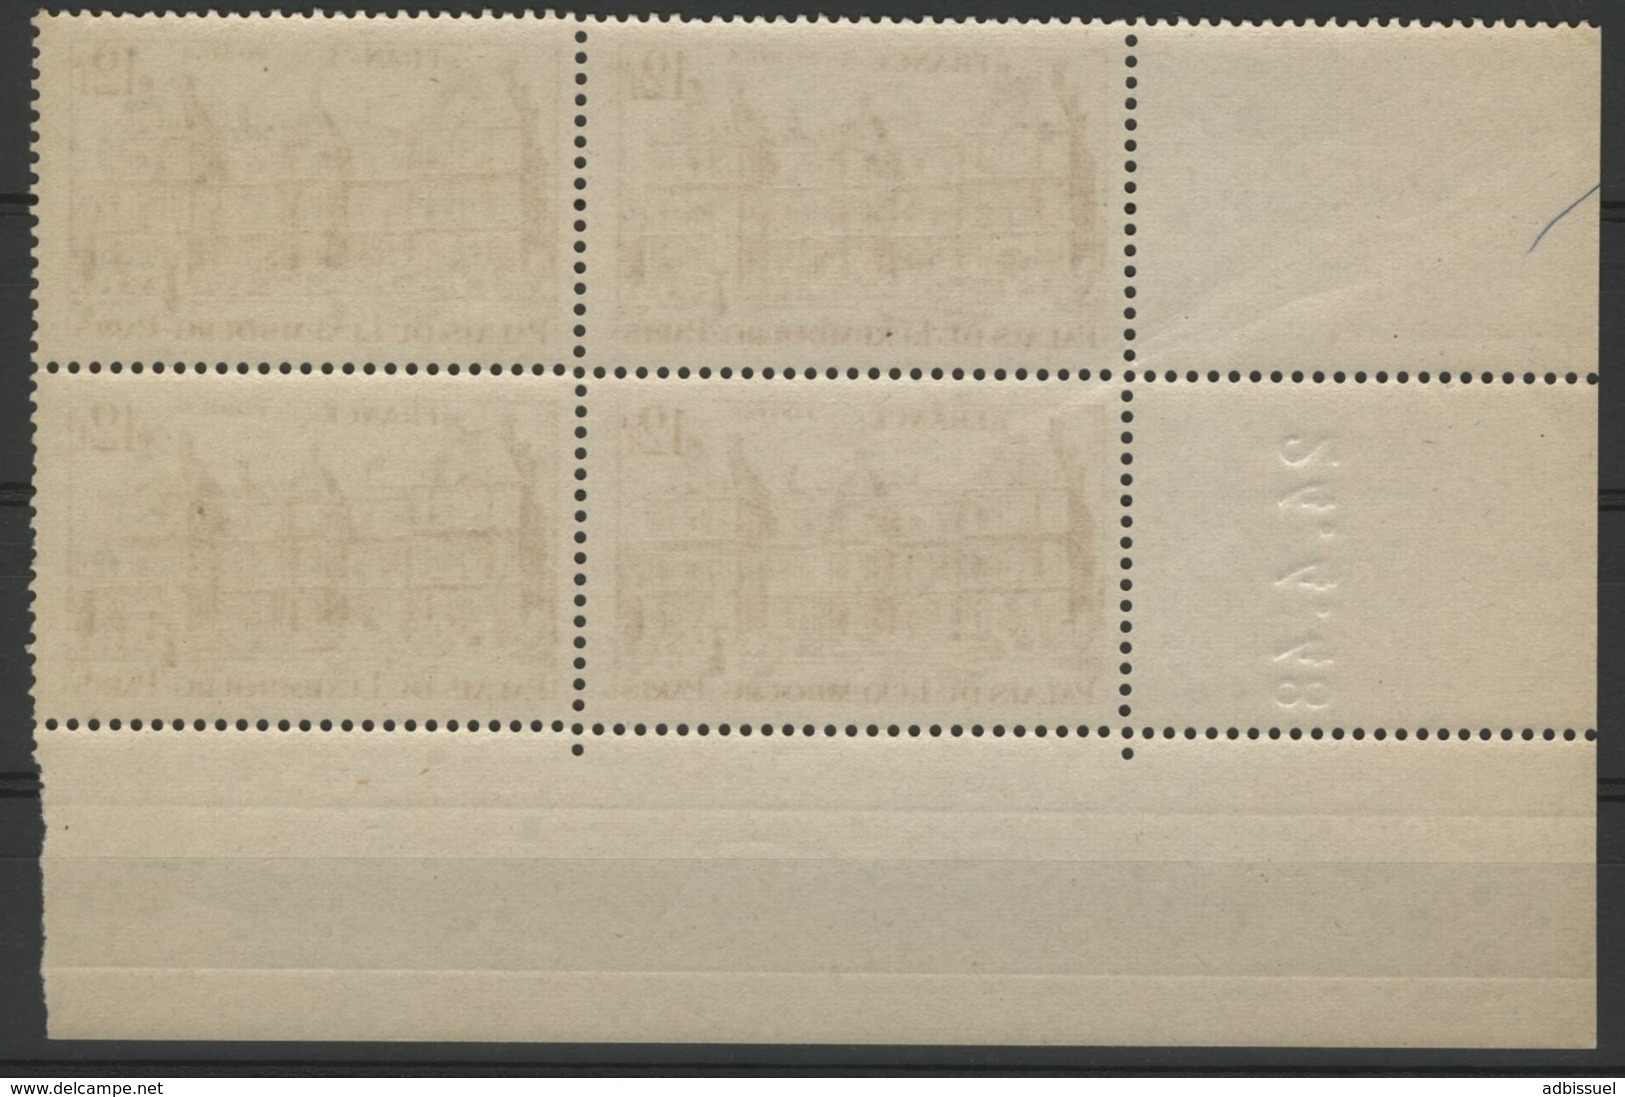 "N° 803 ** (MNH). Cote 19 €. Coin Daté Du 24/4/48 / ""Palais Du Luxembourg"" - Ecken (Datum)"